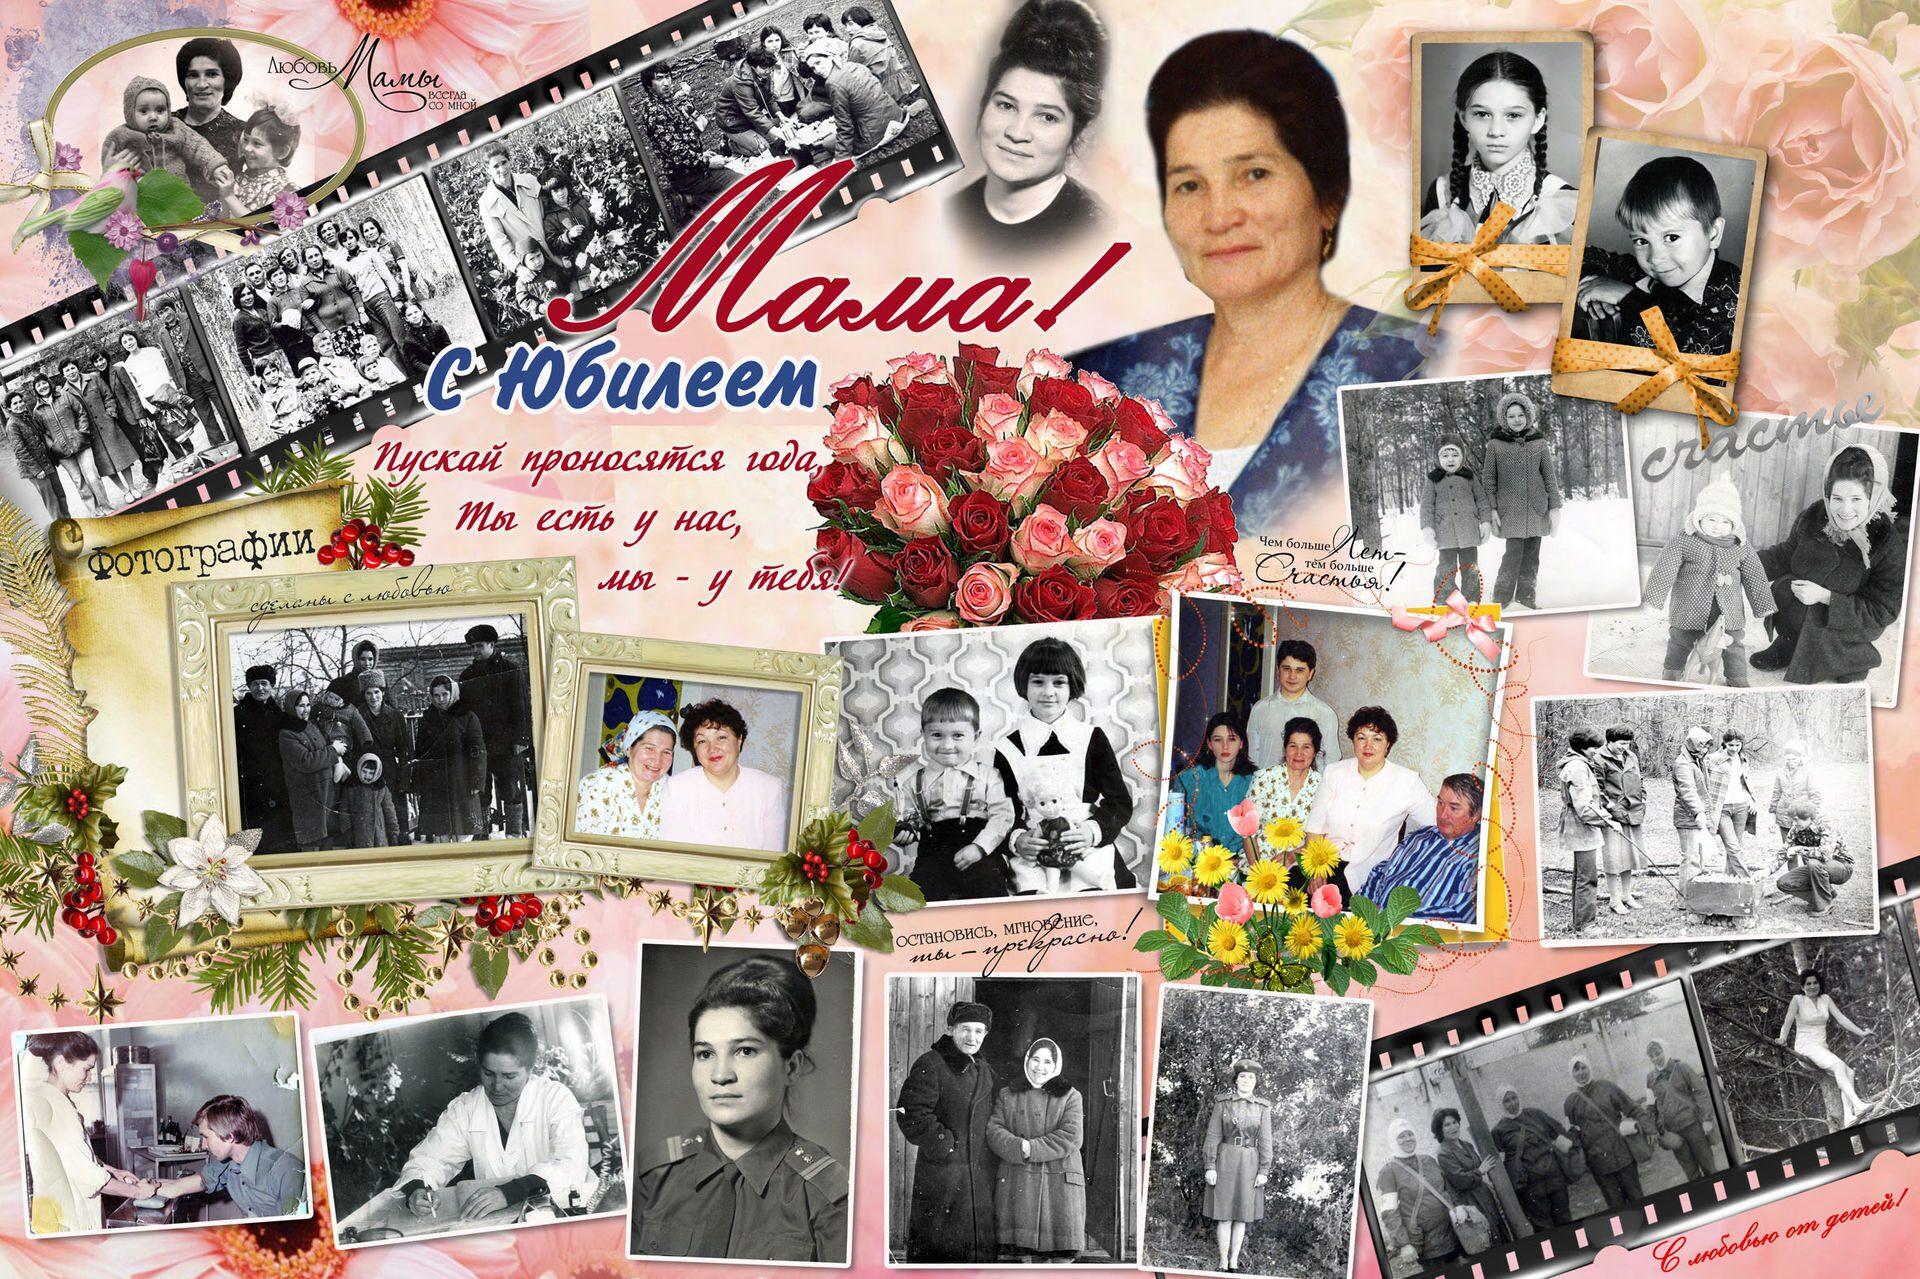 Поздравление маме на юбилей 60 лет фото